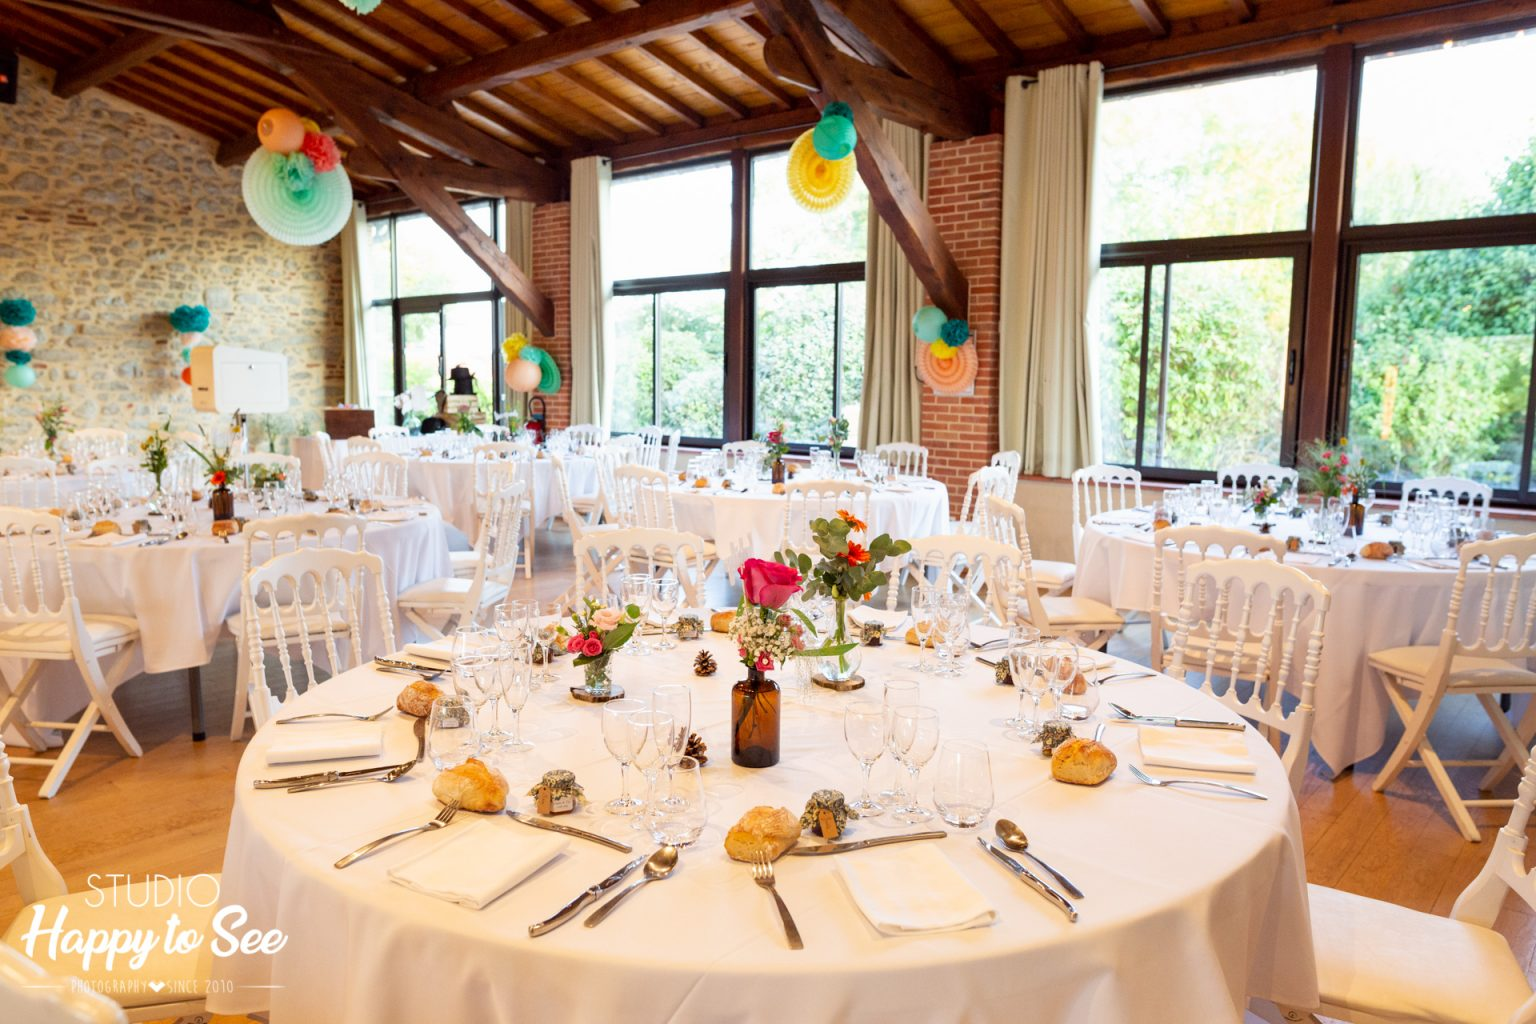 50-Salle-mariage-Domaine-Combe-Ramond-1536x1024